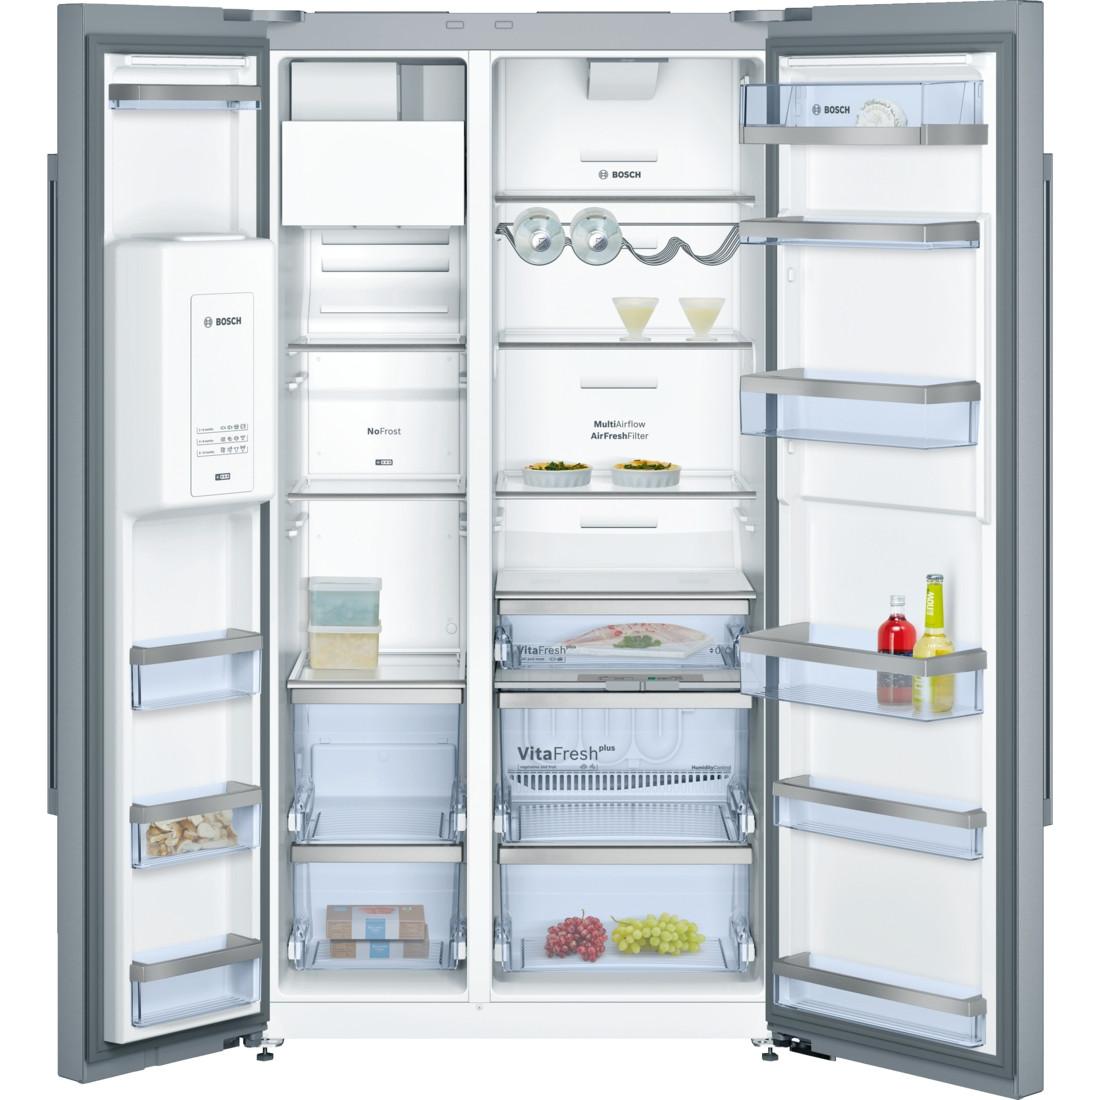 Buy the Bosch Serie 6 American-Style Stainless Steel Fridge Freezer